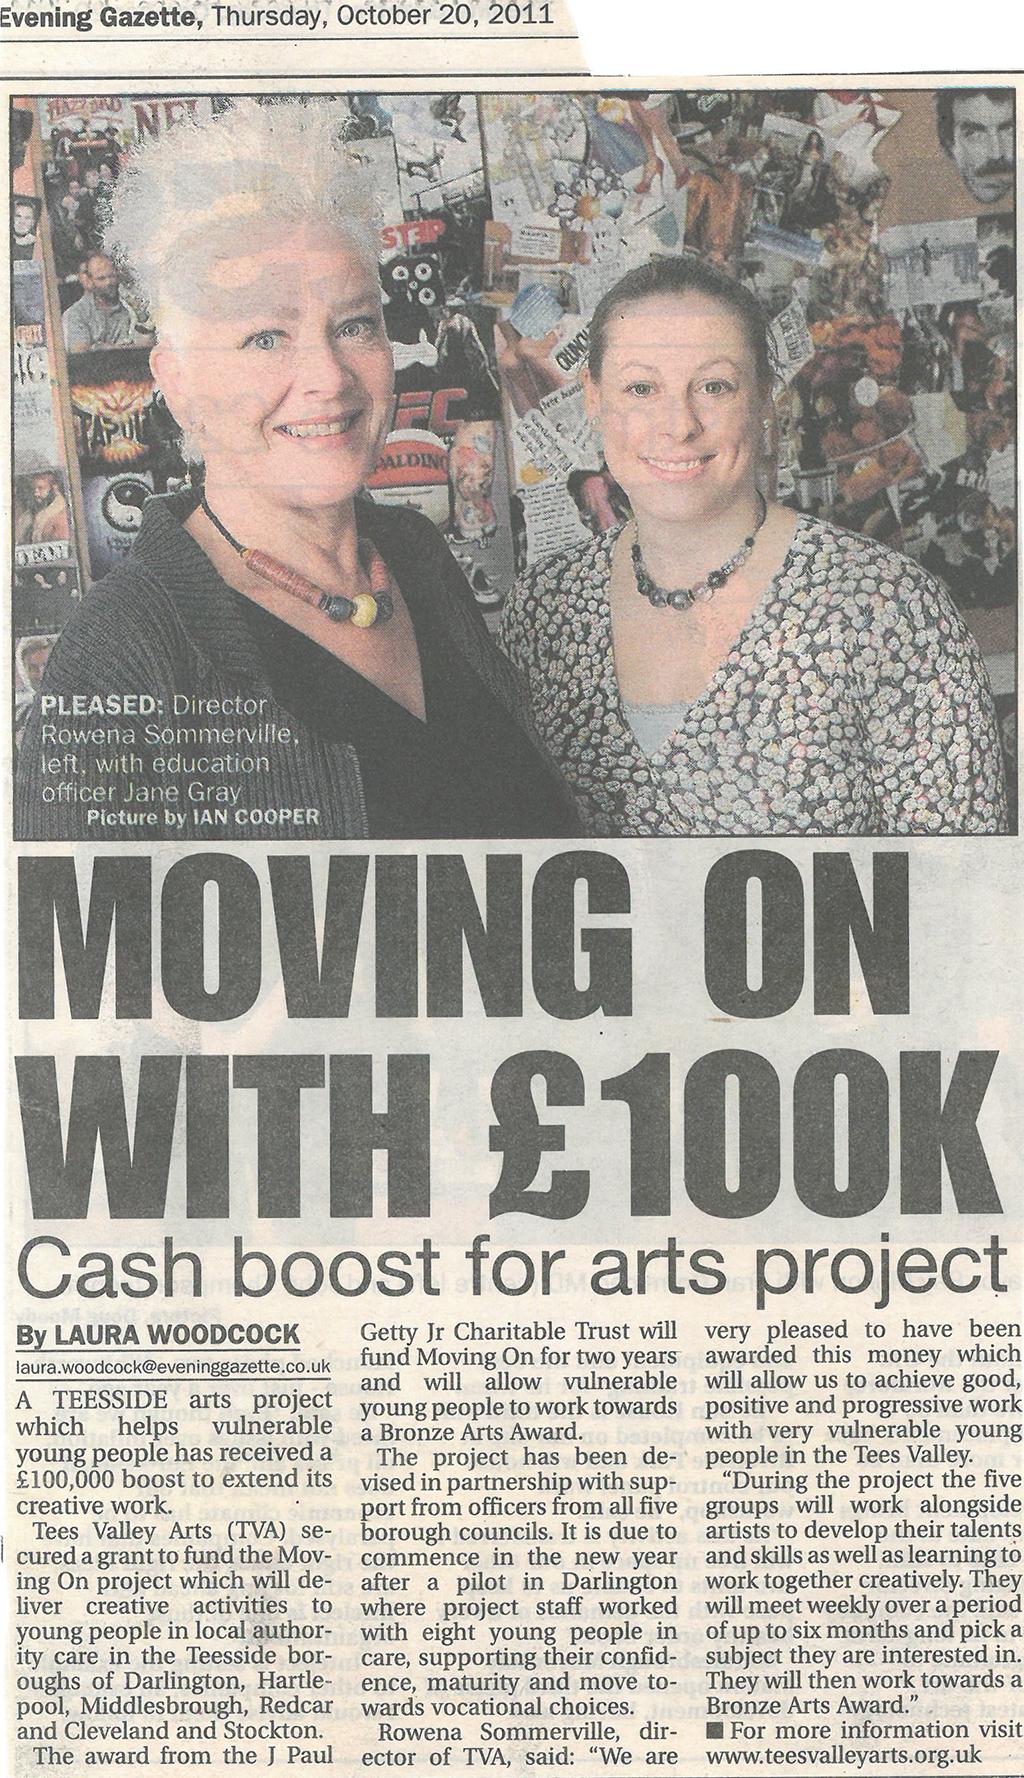 2011-10-20, Evening Gazette